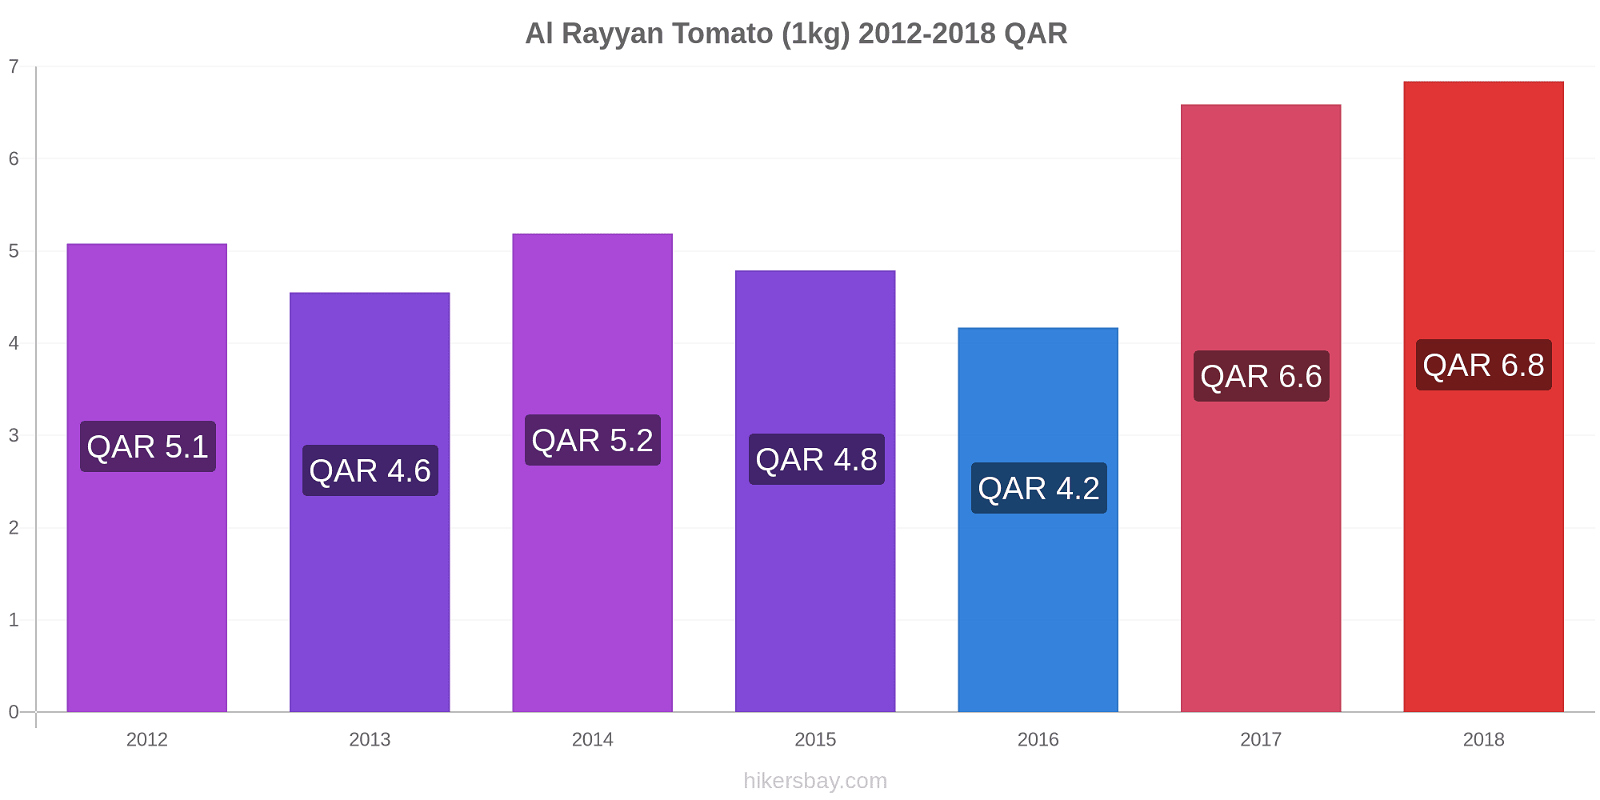 Al Rayyan price changes Tomato (1kg) hikersbay.com